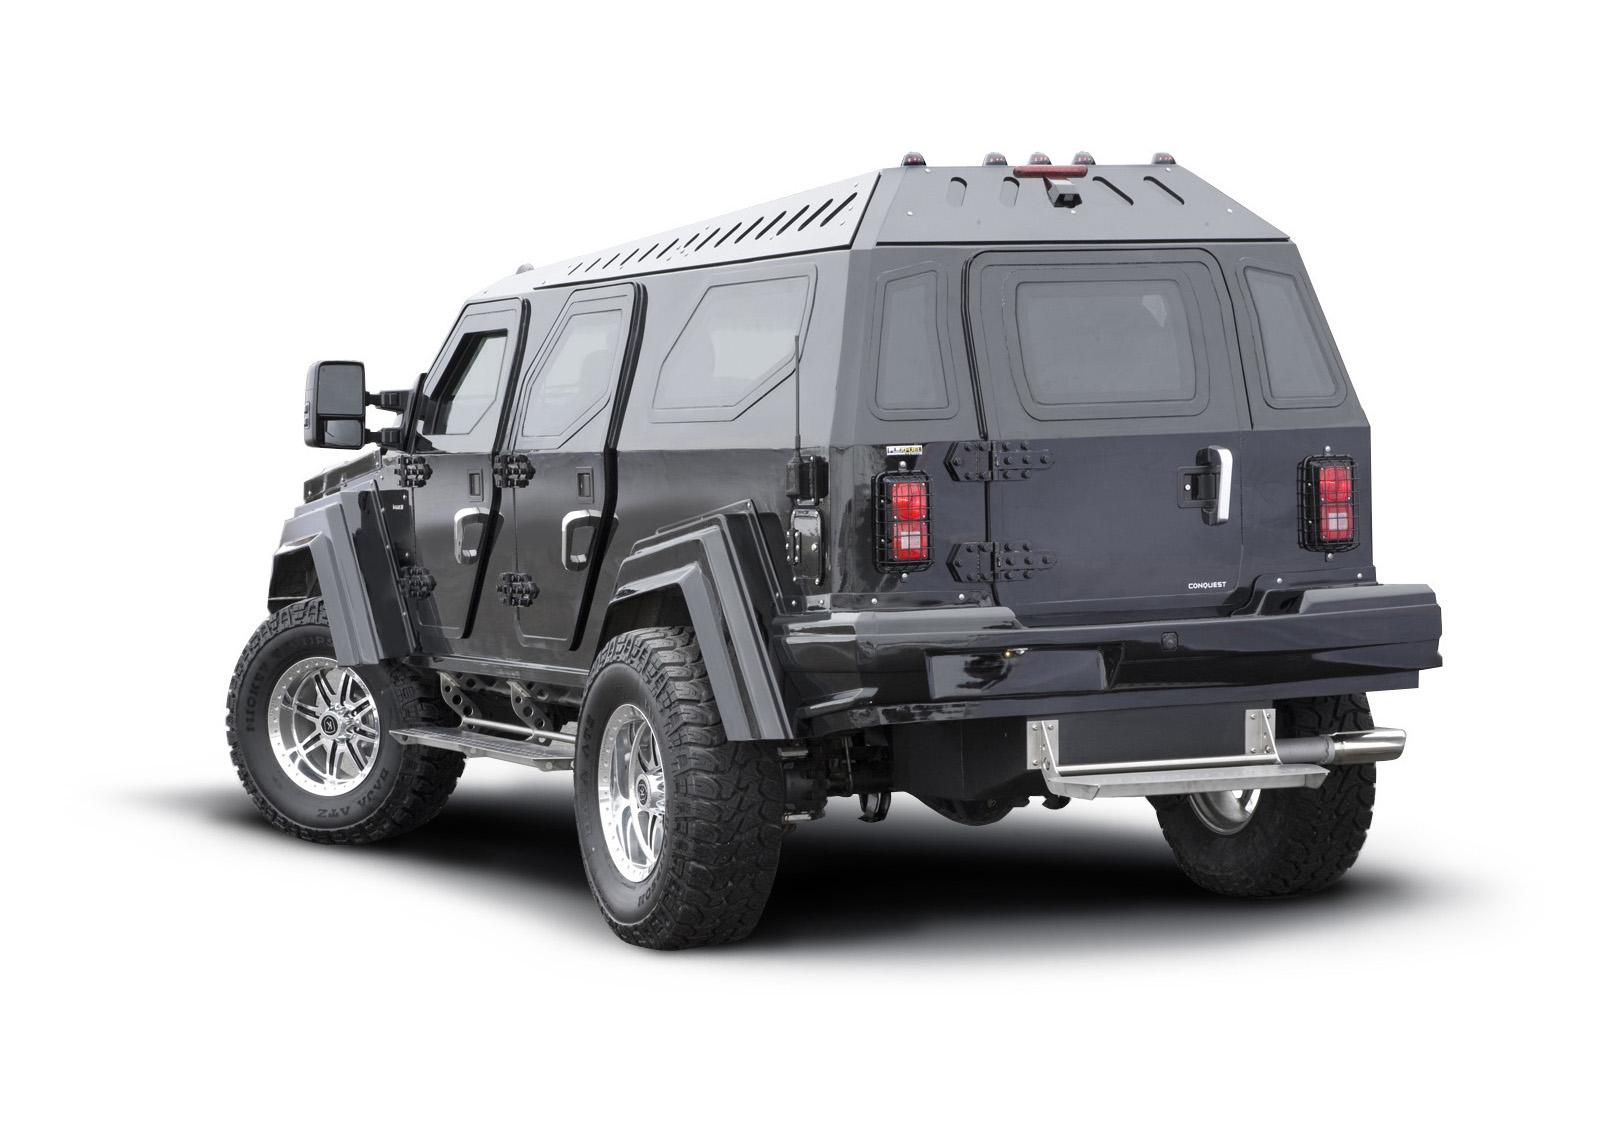 Top Motorist - Conquest Vehicles - Automotive Review | knight xv vs hummer h2